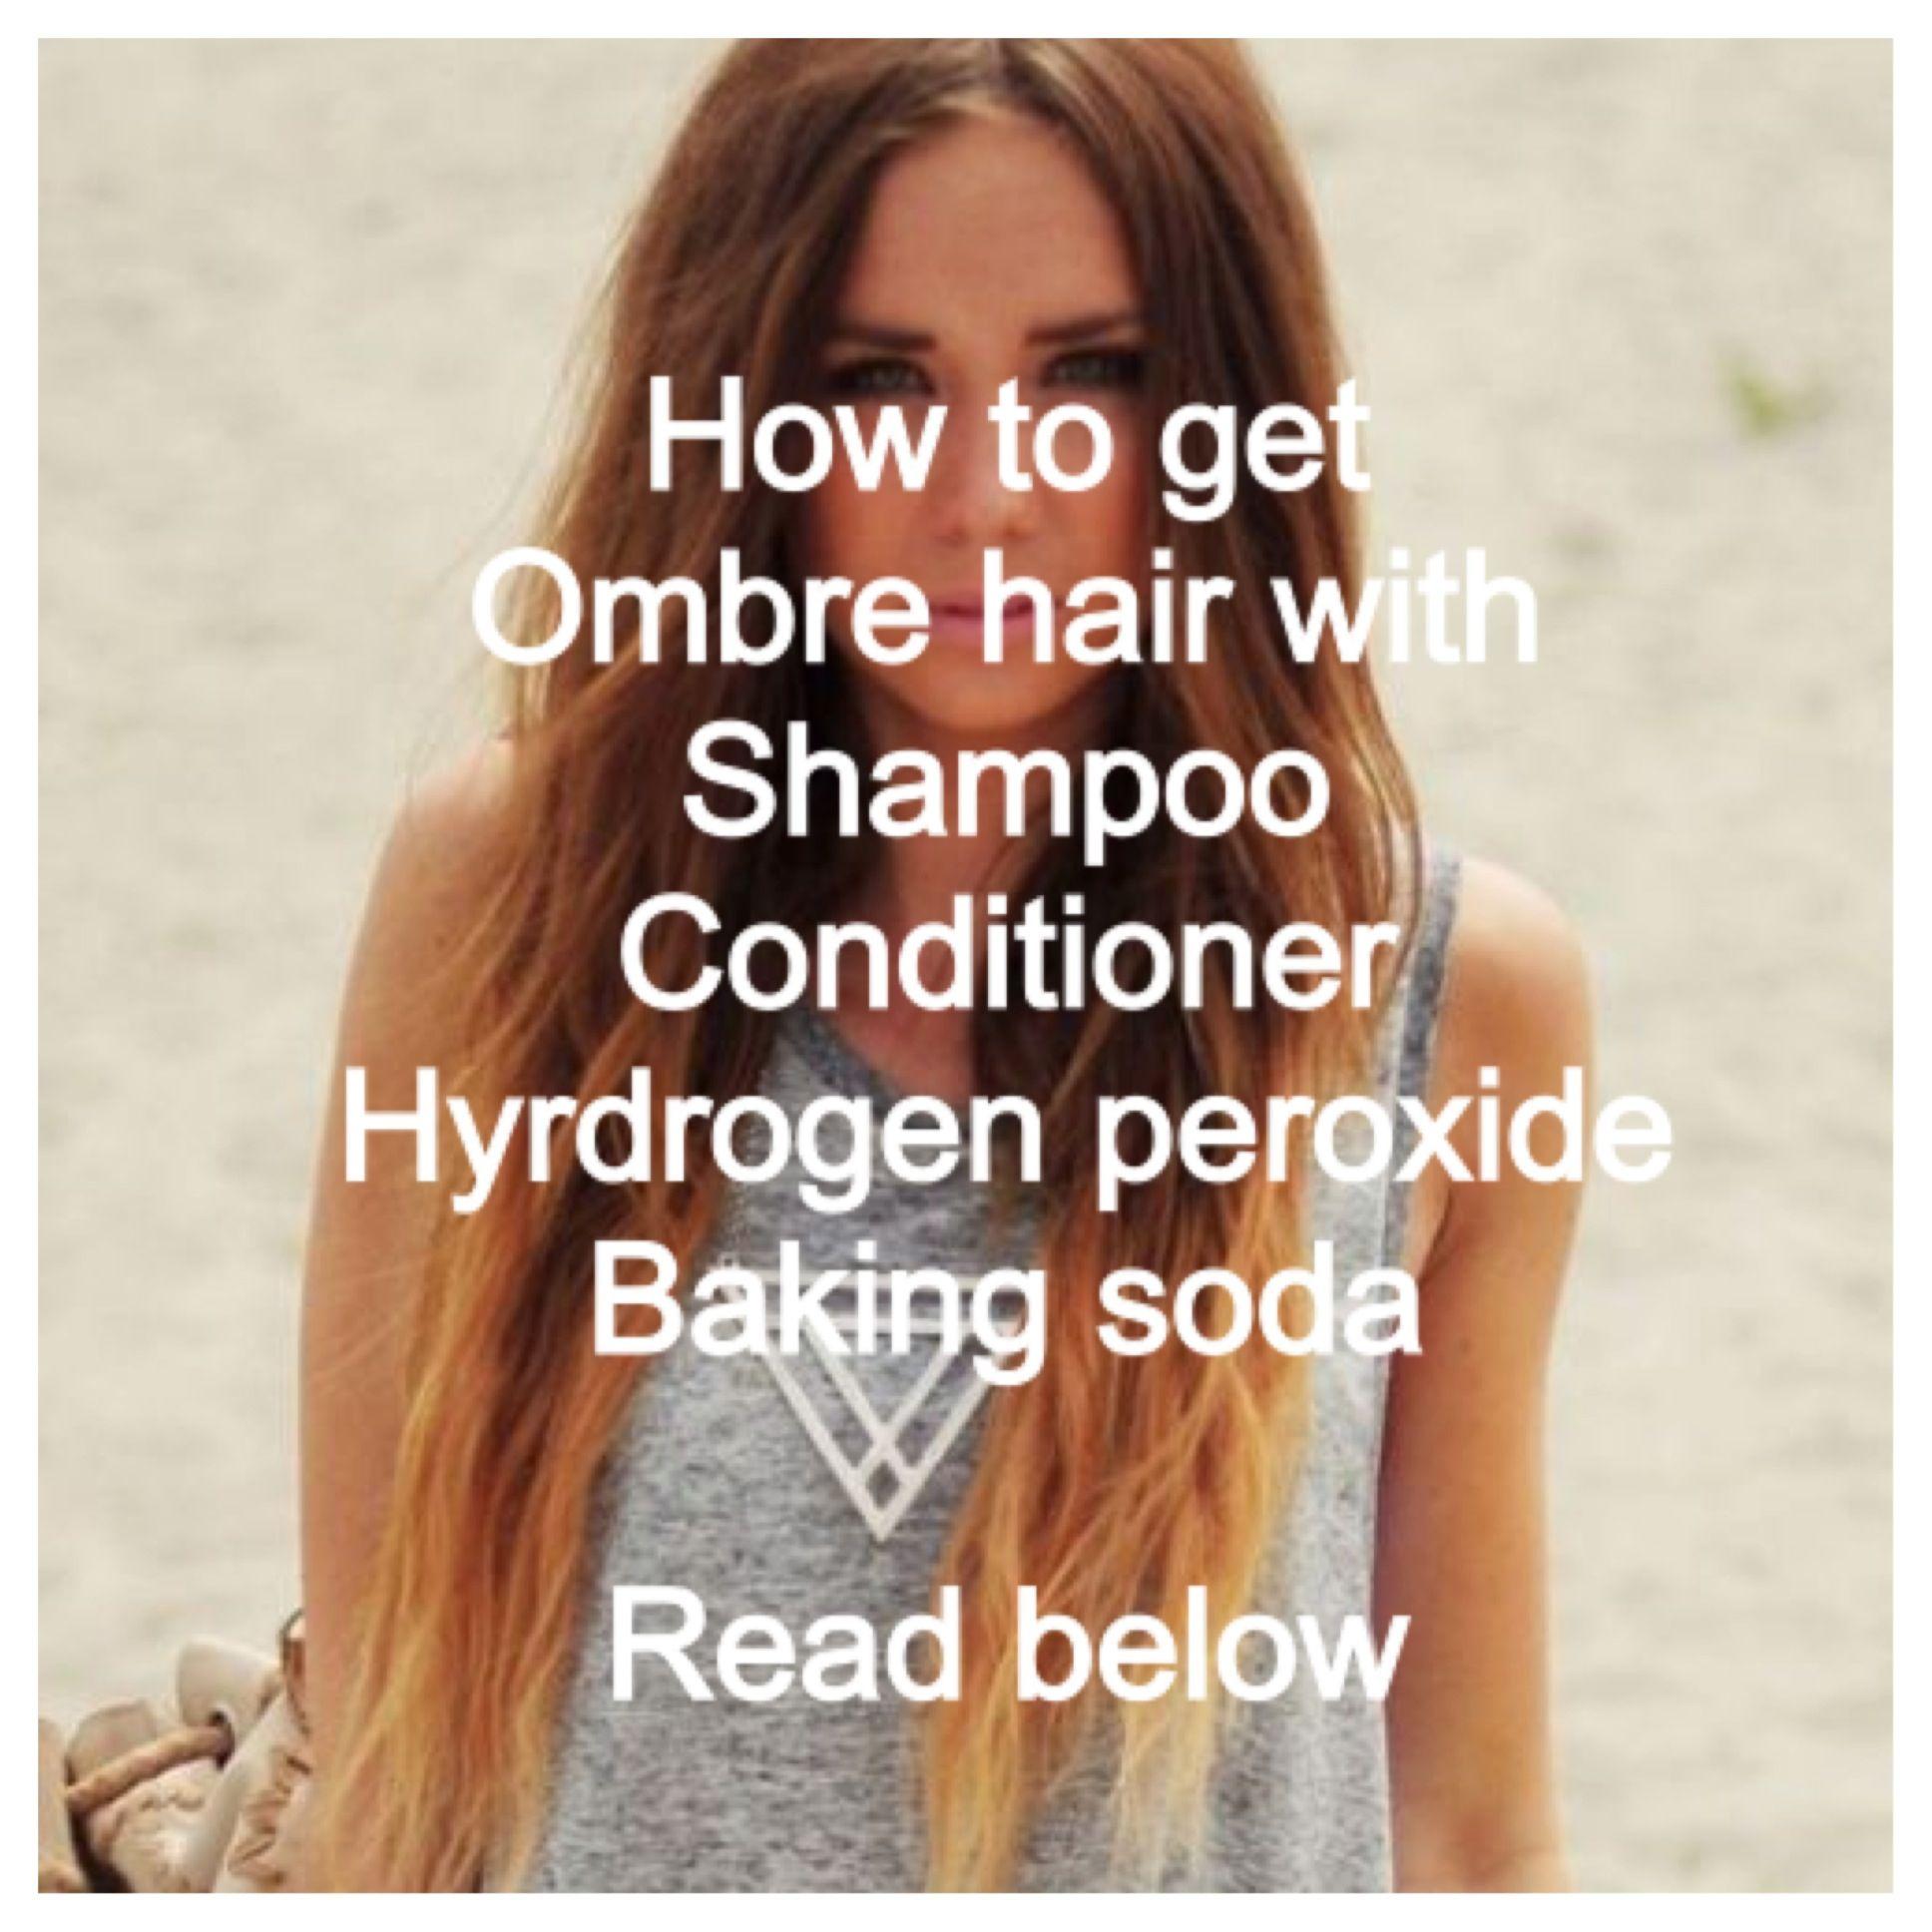 How To Lighten Bleach Your Hair Ingredients Shampoo Conditioner Hydrogen Peroxide Baking Soda Pai Bleaching Your Hair Peroxide Hair Hydrogen Peroxide Hair